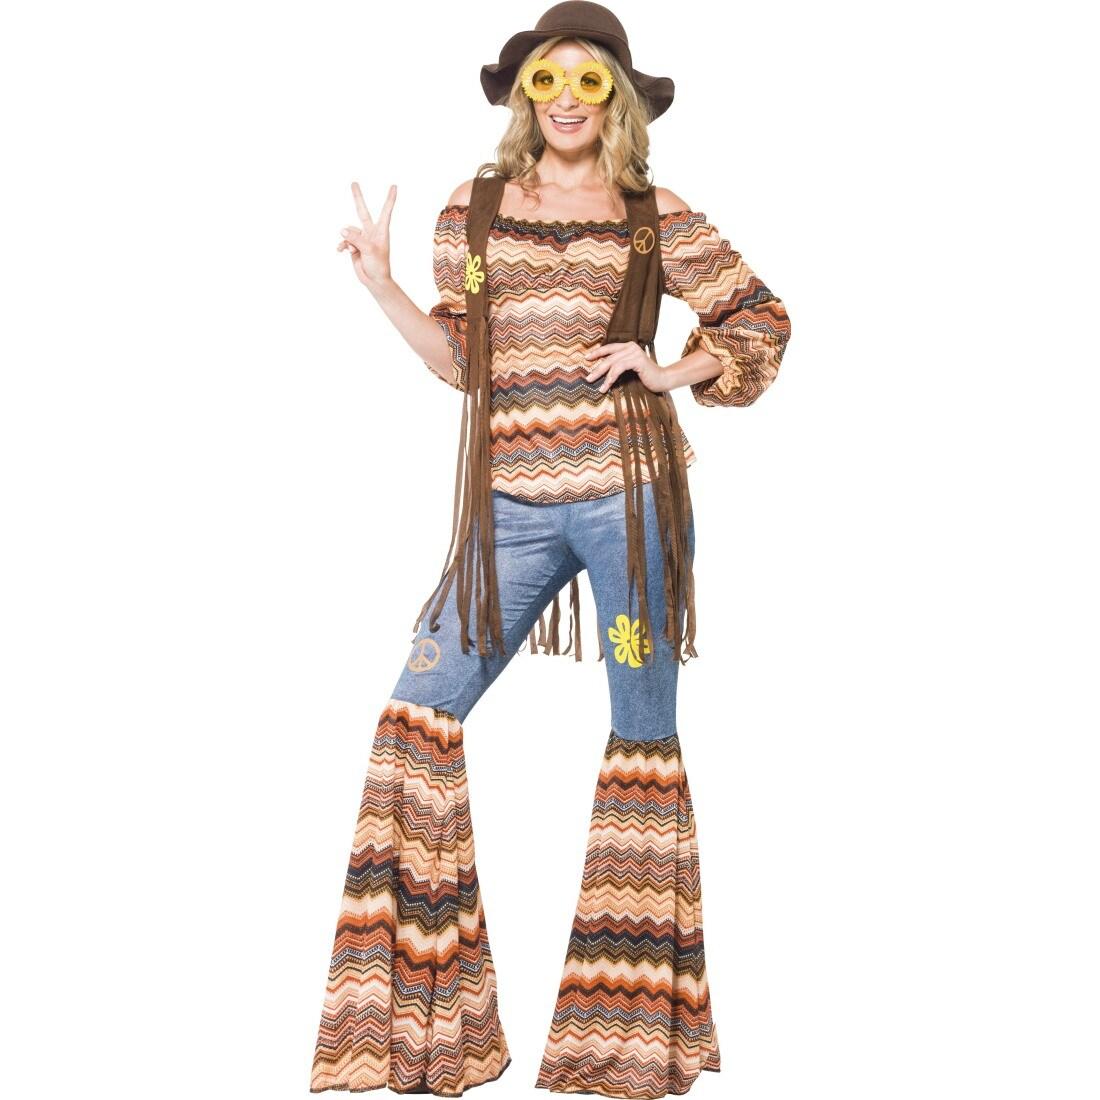 70er jahre outfit hippie kost m 60er jahre vintage hippiekost m flowe 41 99. Black Bedroom Furniture Sets. Home Design Ideas